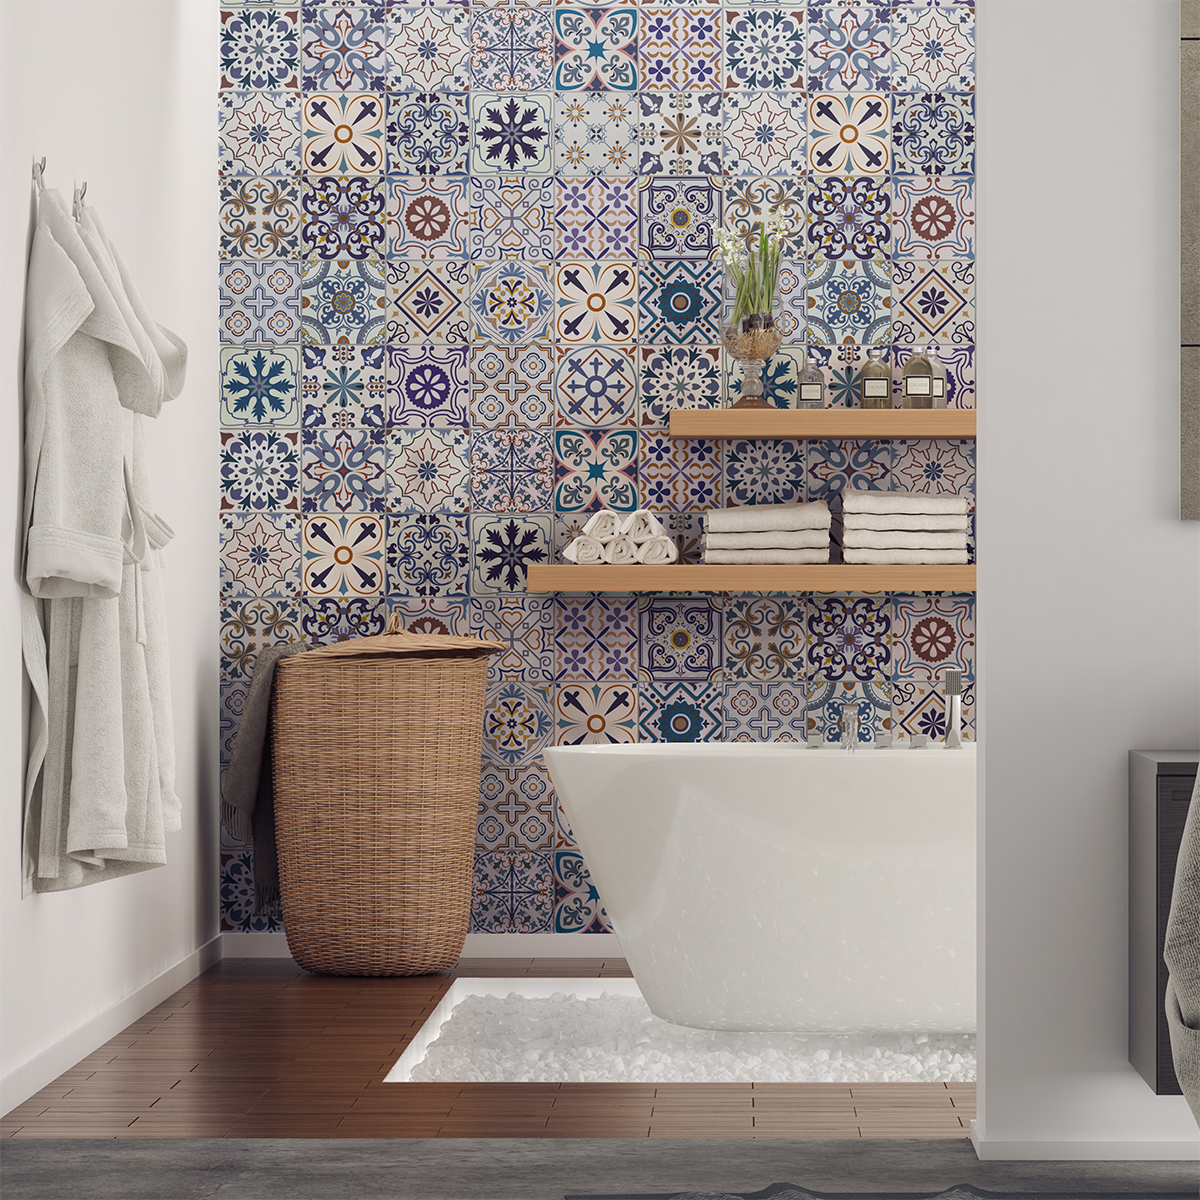 30 stickers carrelages azulejos riviera salle de bain et - Stickers sur carrelage salle de bain ...